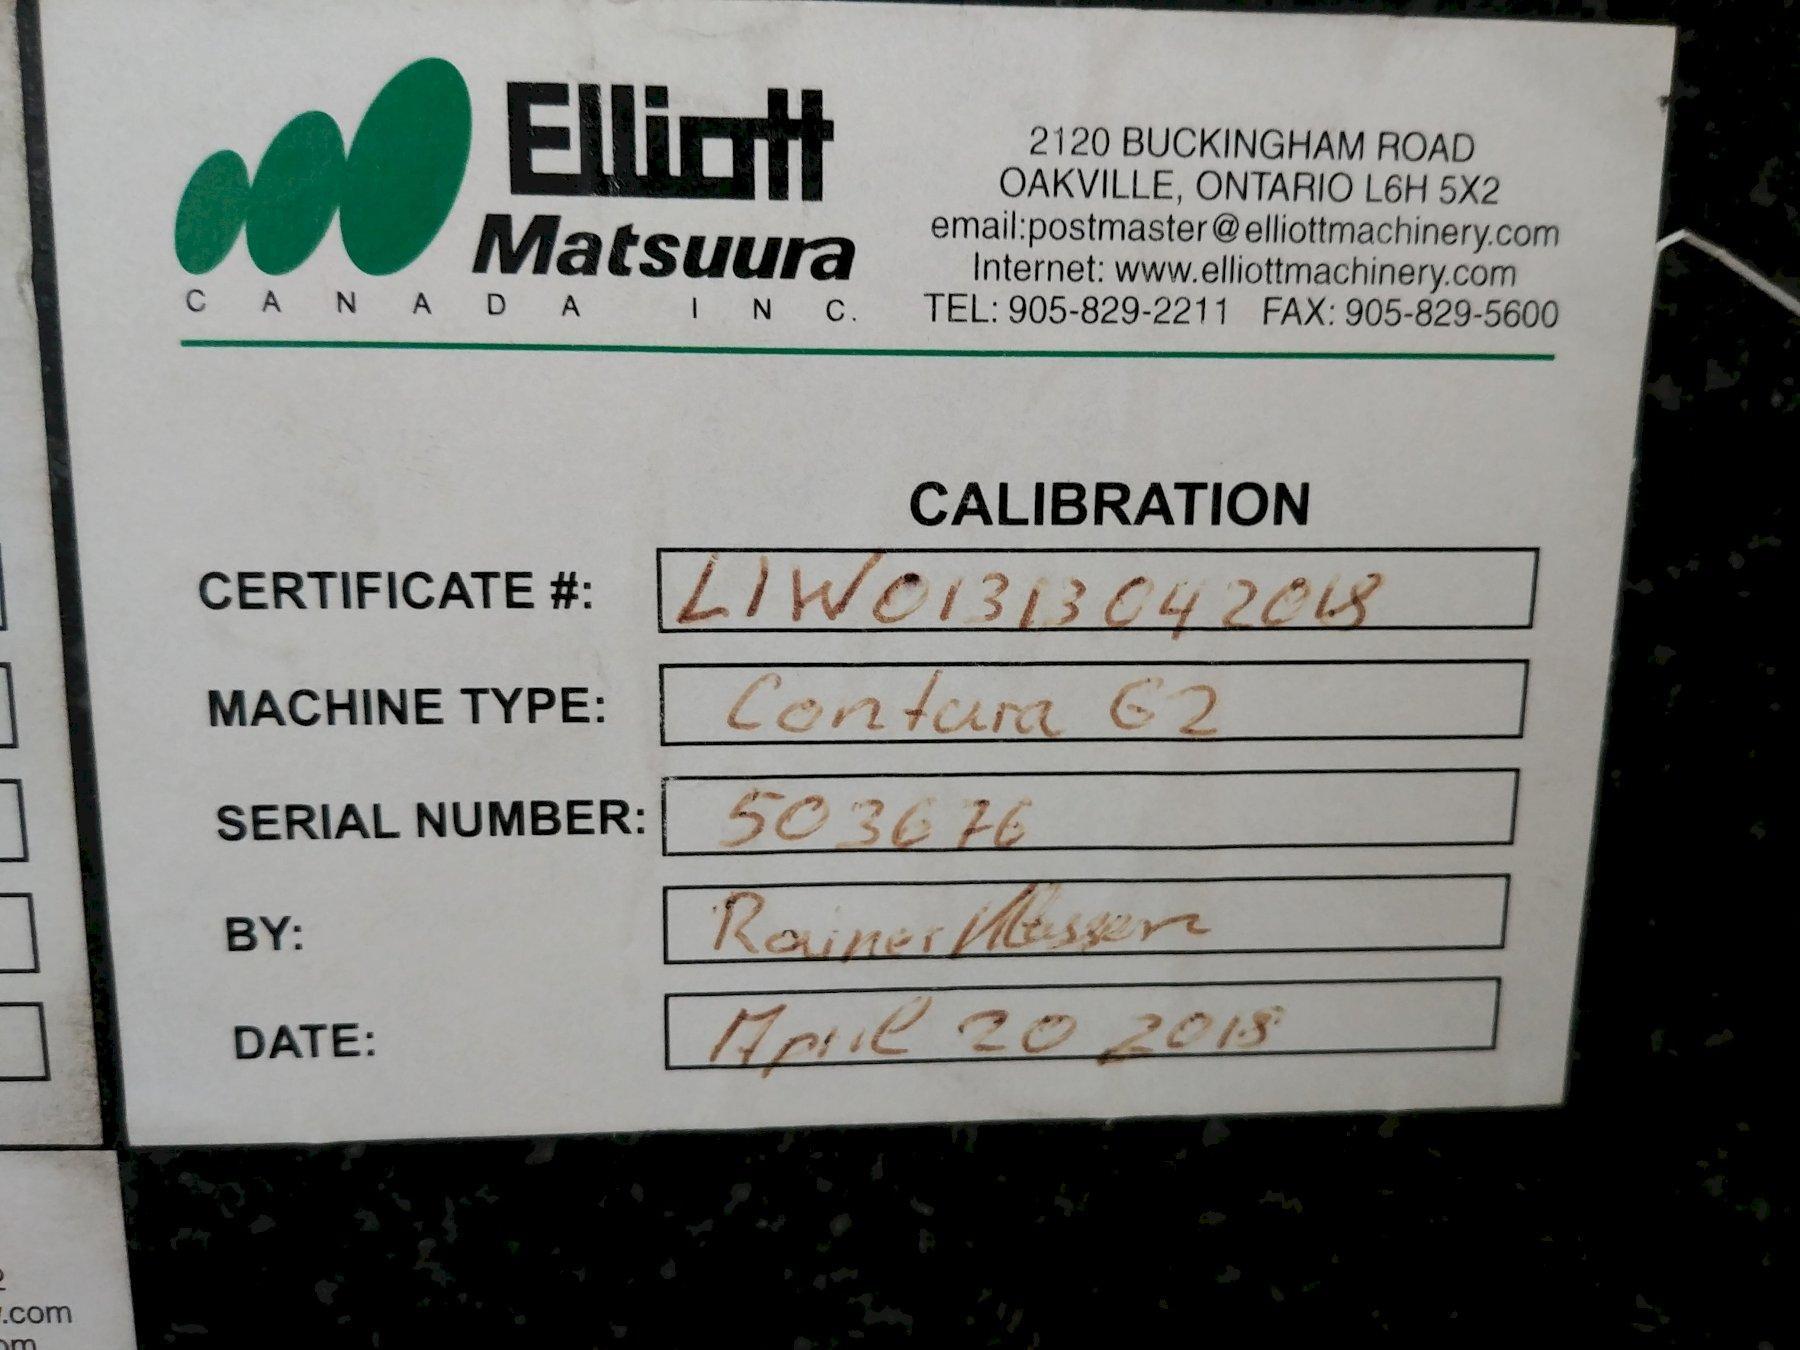 Zeiss Contura G2 10/16/6 Coordinate Measuring Machine (CMM) (#33218)